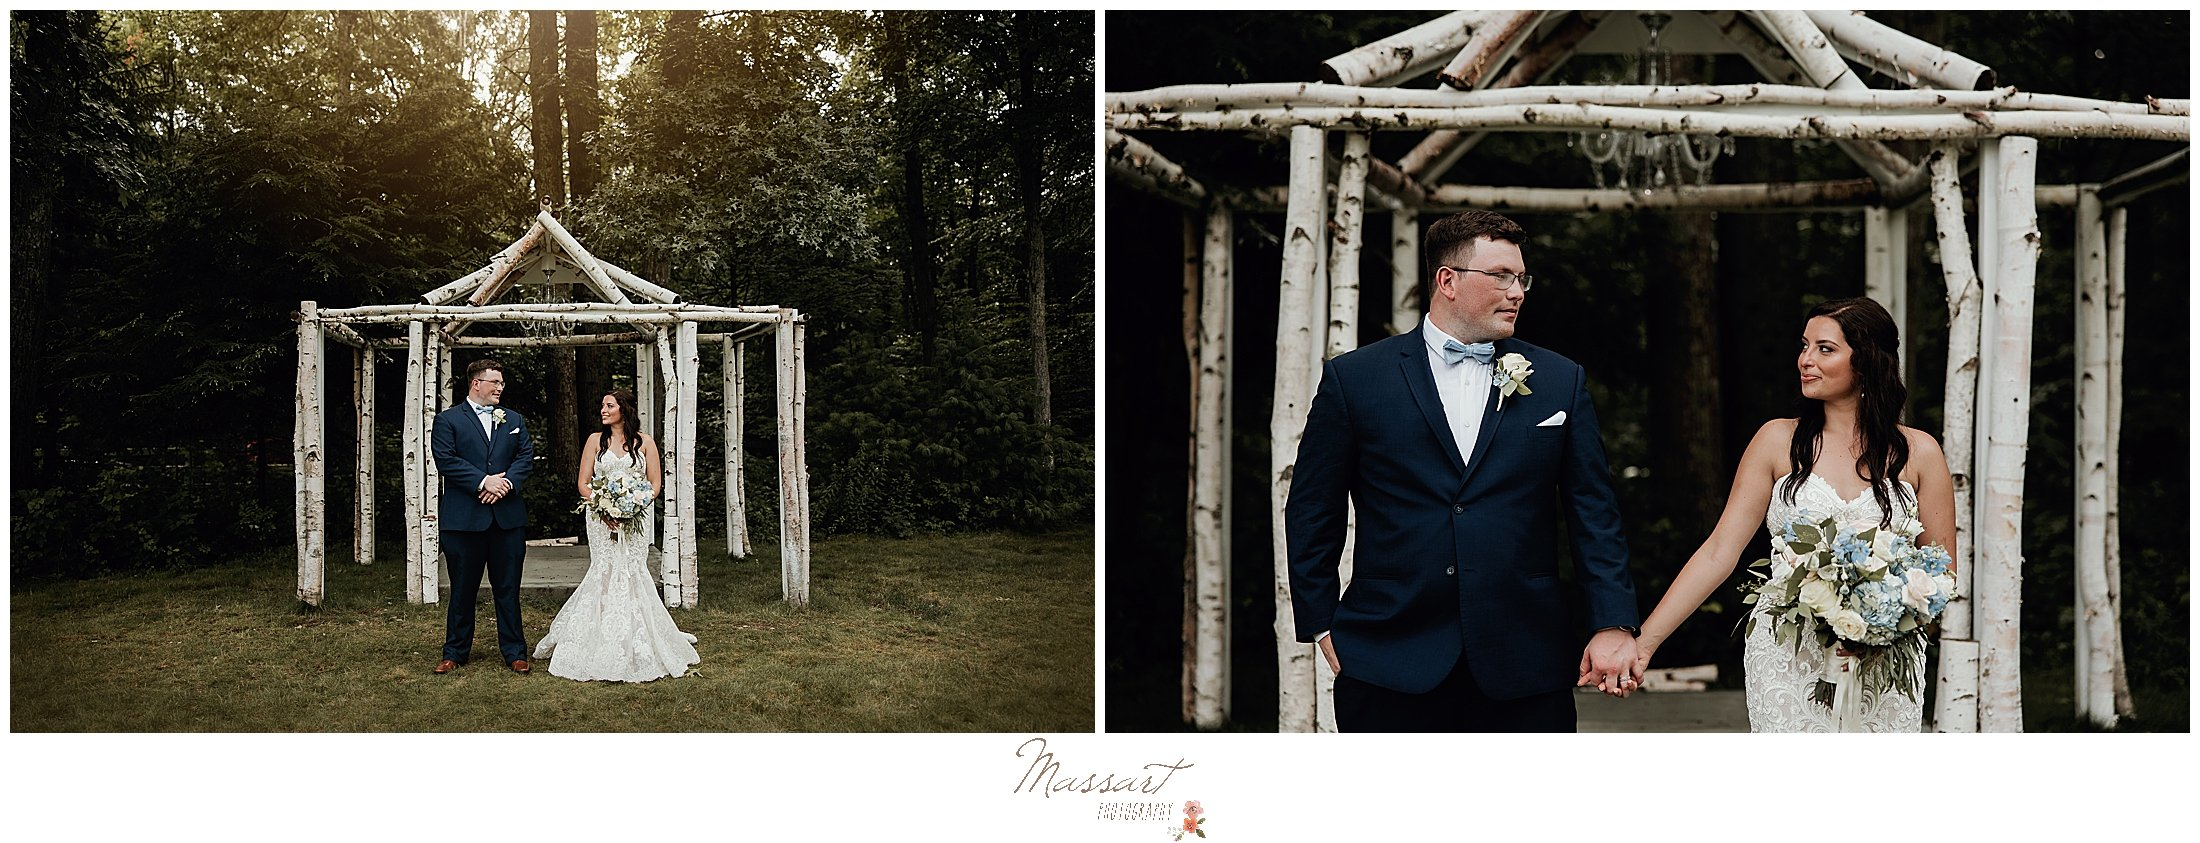 Couple poses under trellis at Five Bridge Inn in MA for RI photographers